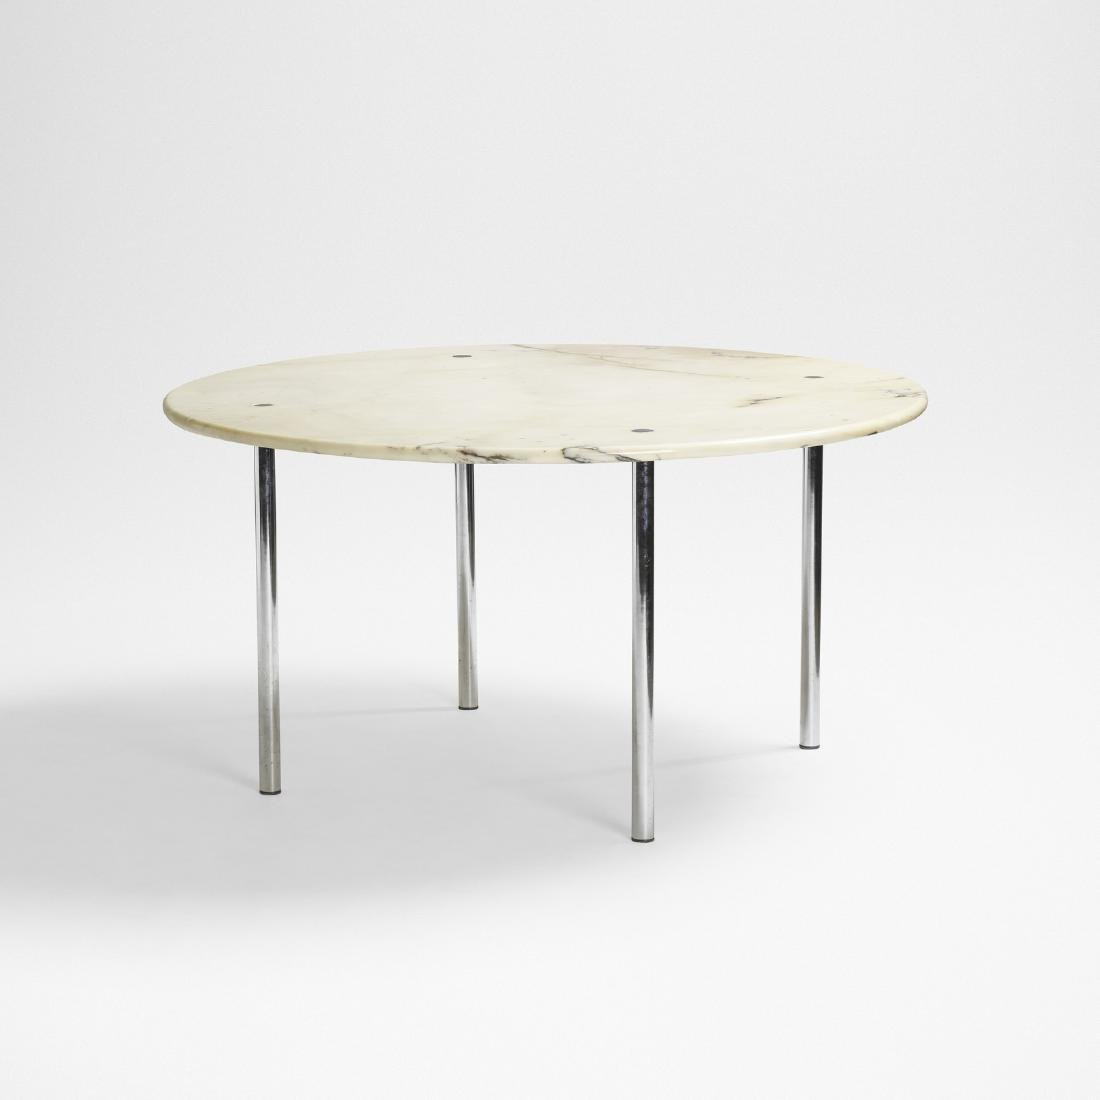 Katavolos, Littell & Kelley, Tinos dining table, 8-M